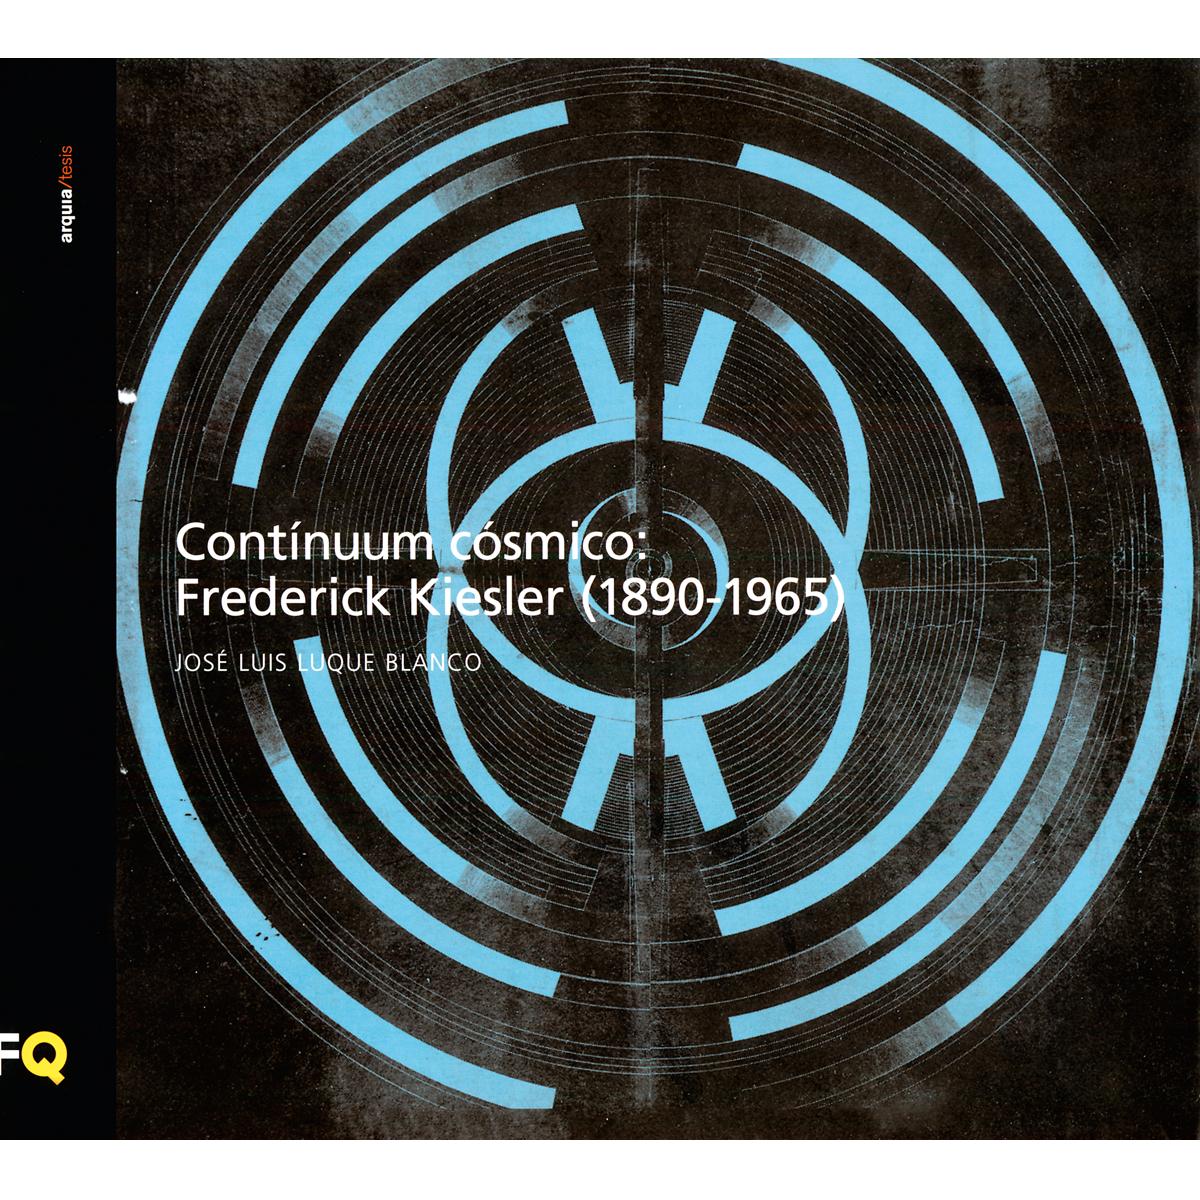 Contínuum cósmico: Frederick Kiesler (1890-1965)